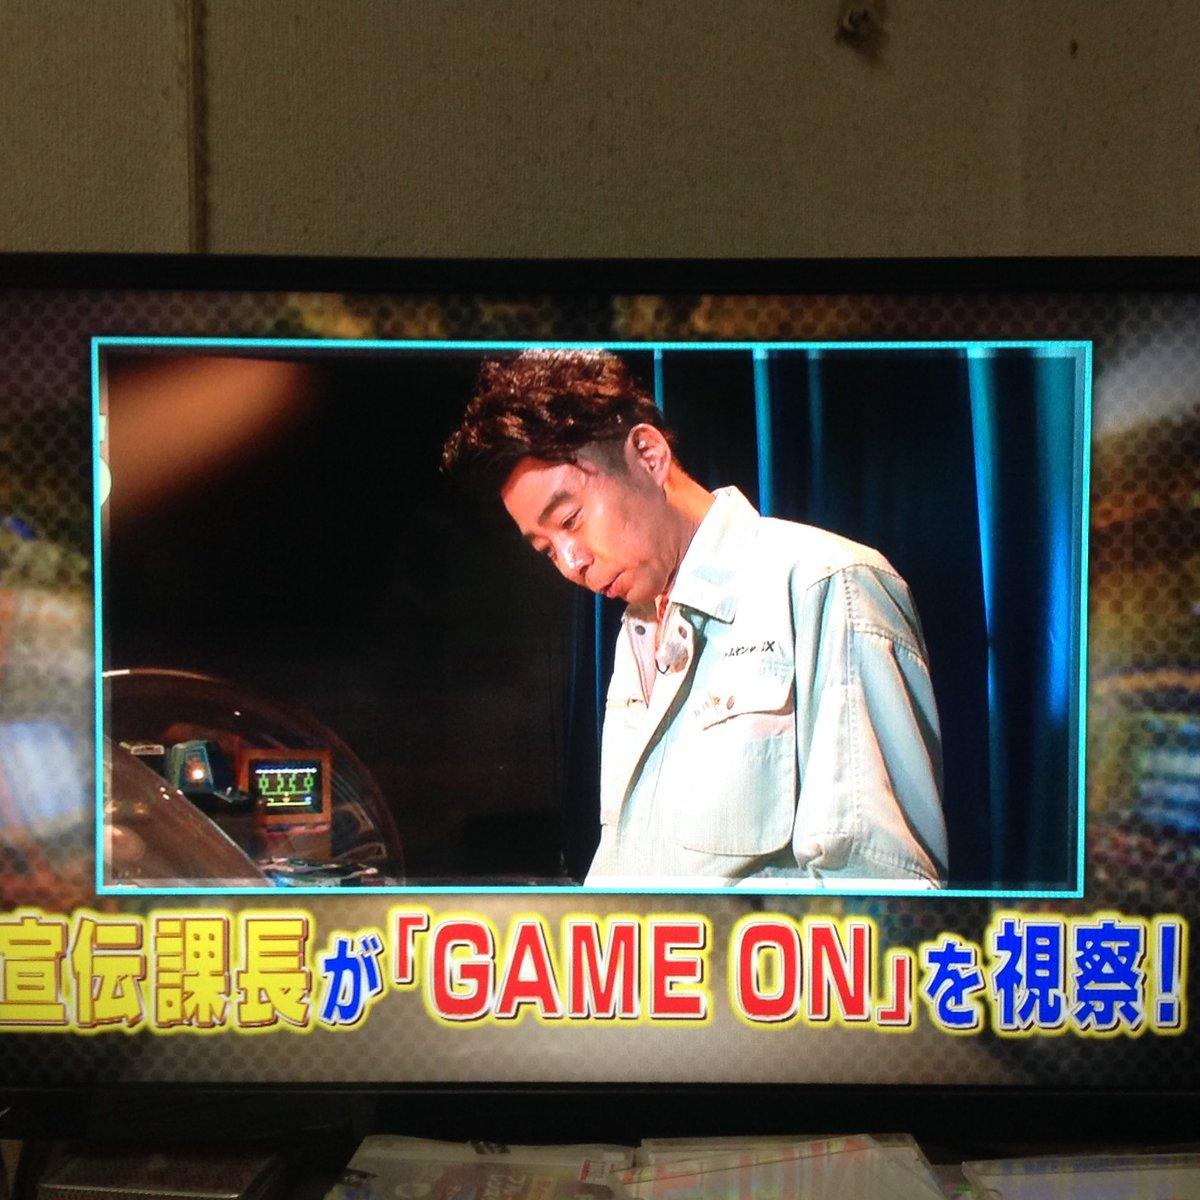 GAME ON! 地上波4/8(金)2:25〜放送決定! #gccx #ゲームオン https://t.co/yhfhJAqPn5